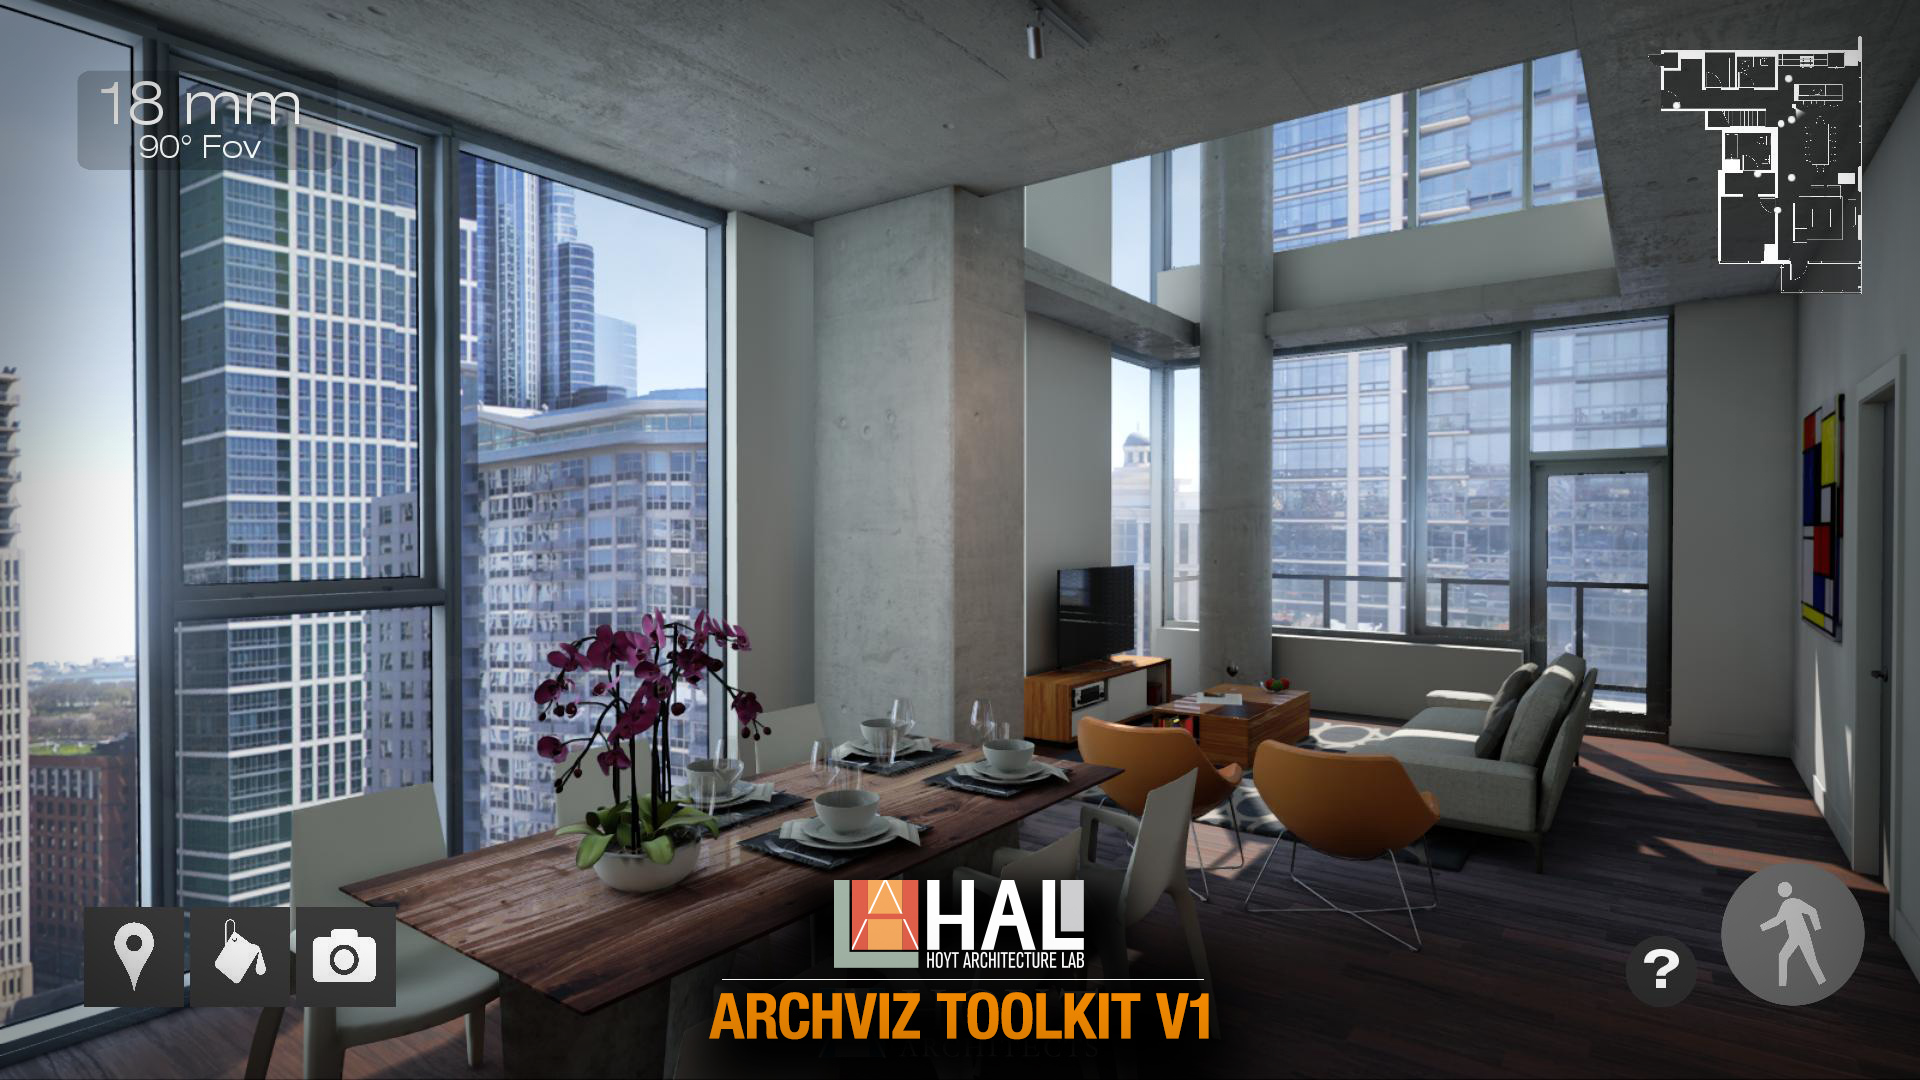 hal archviz toolkit v1 by hal in architectural visualization ue4 hal archviz toolkit v1 by hal in architectural visualization ue4 marketplace